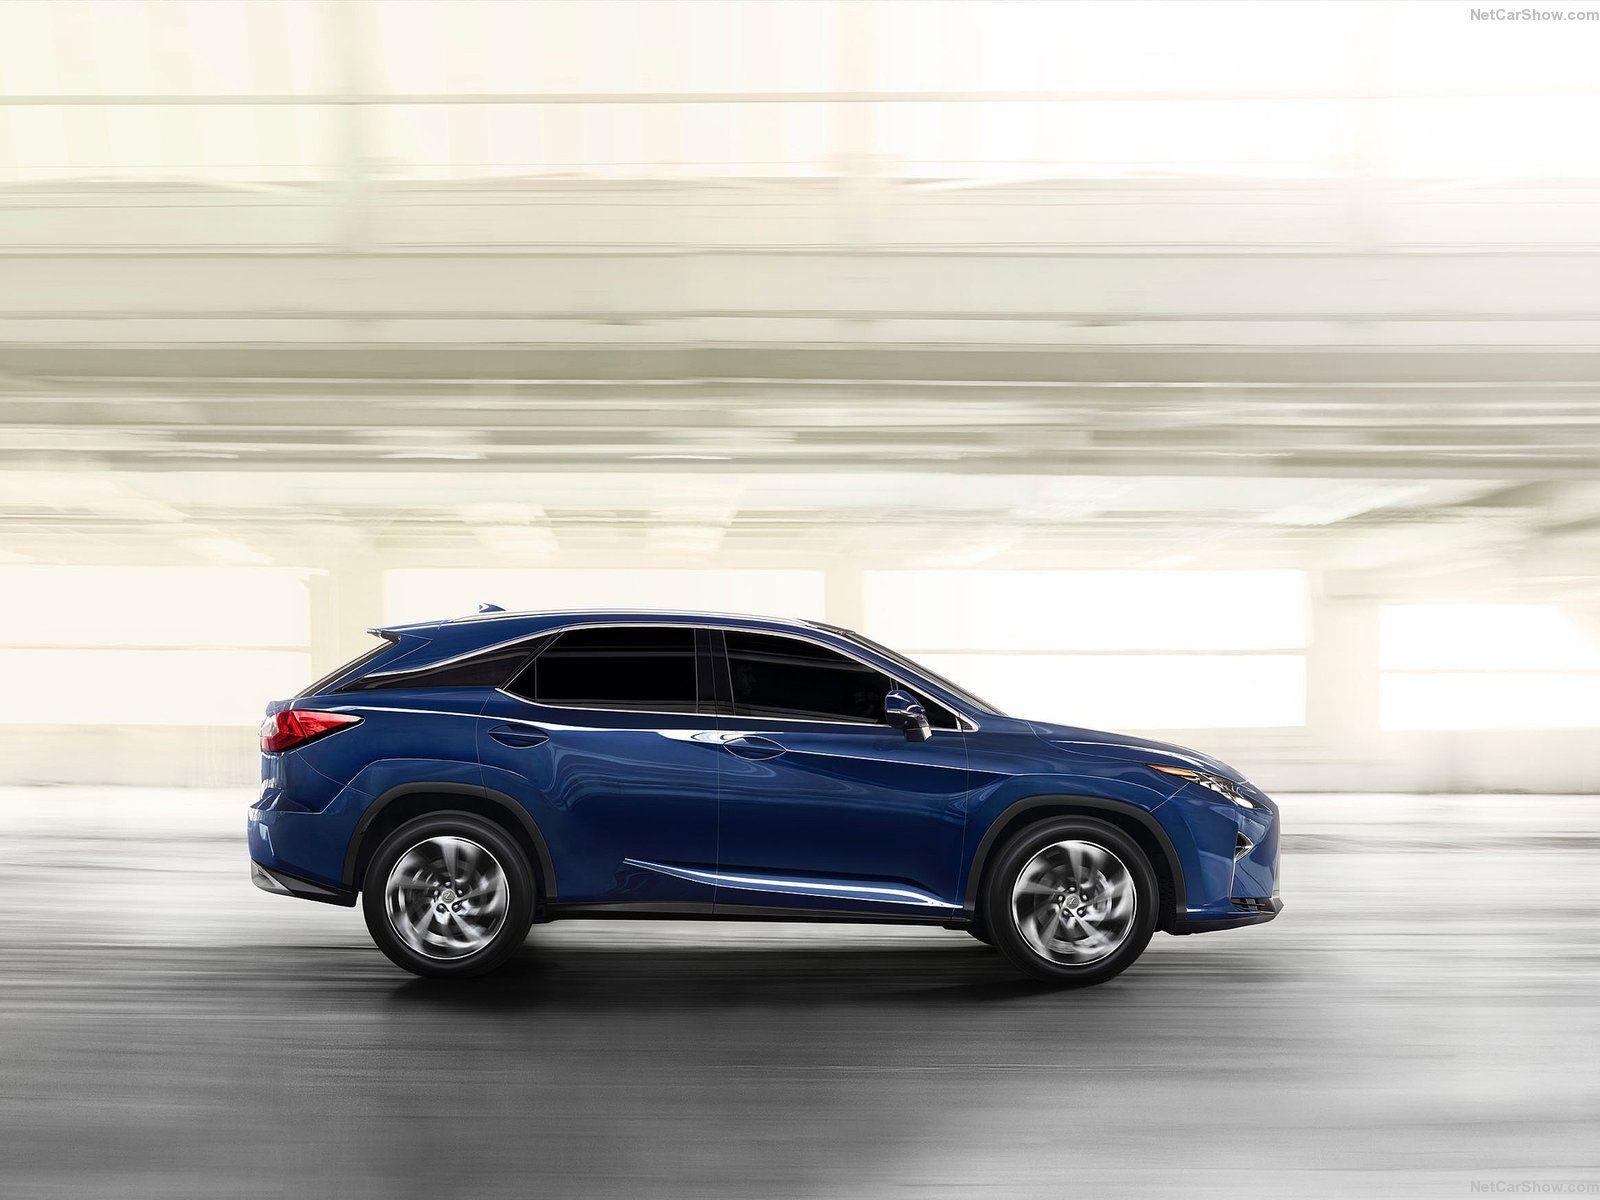 2016 Lexus RX 450h New lexus, New lexus suv, Lexus suv